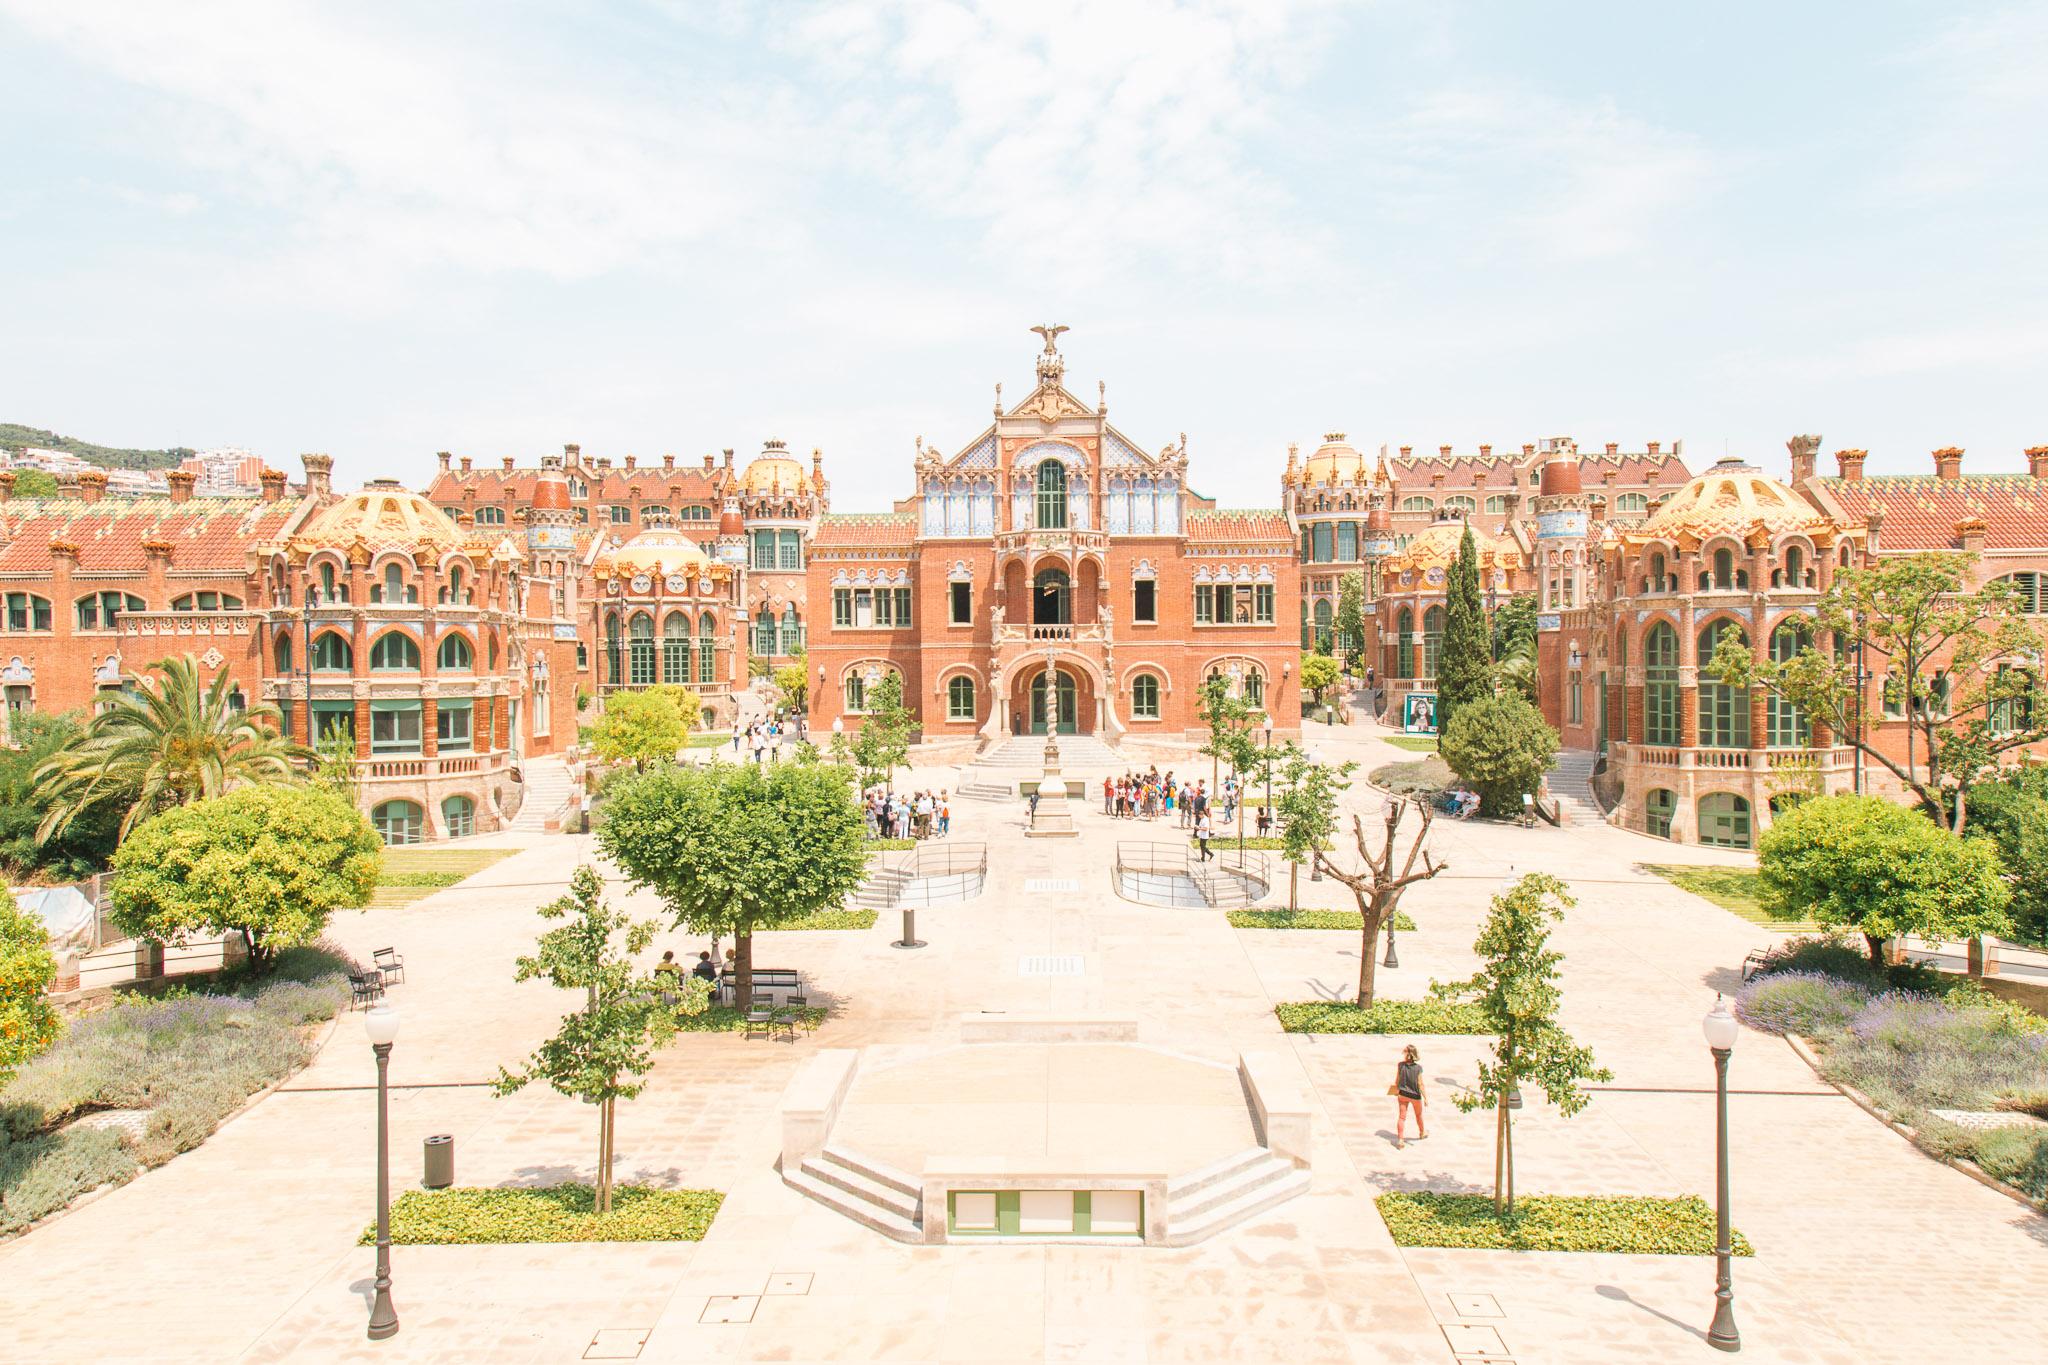 spain-barcelona-hospital-de-sant-pau-19.jpg